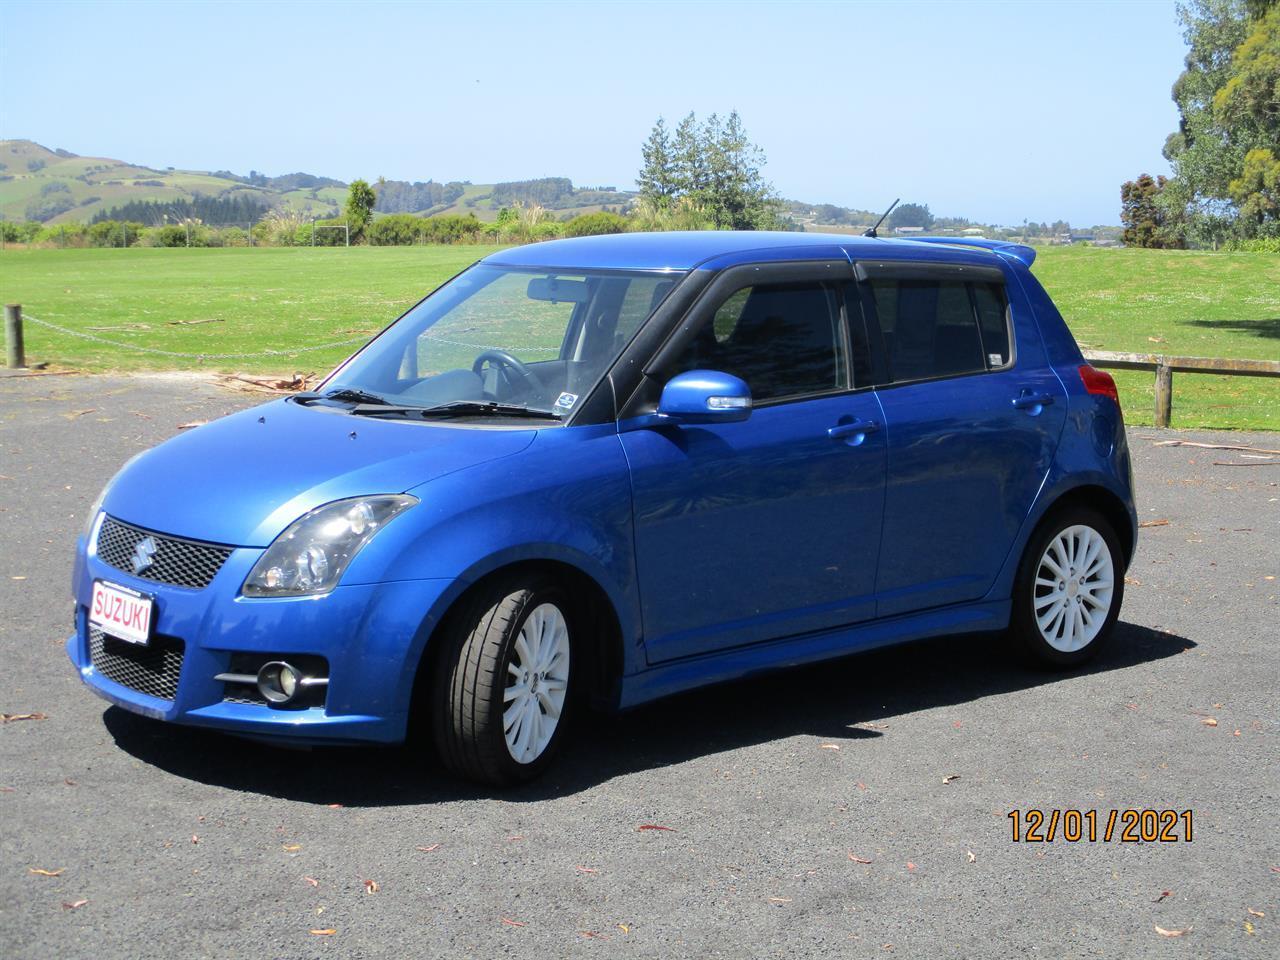 image-2, 2009 Suzuki Swift 1.6 sport at Dunedin